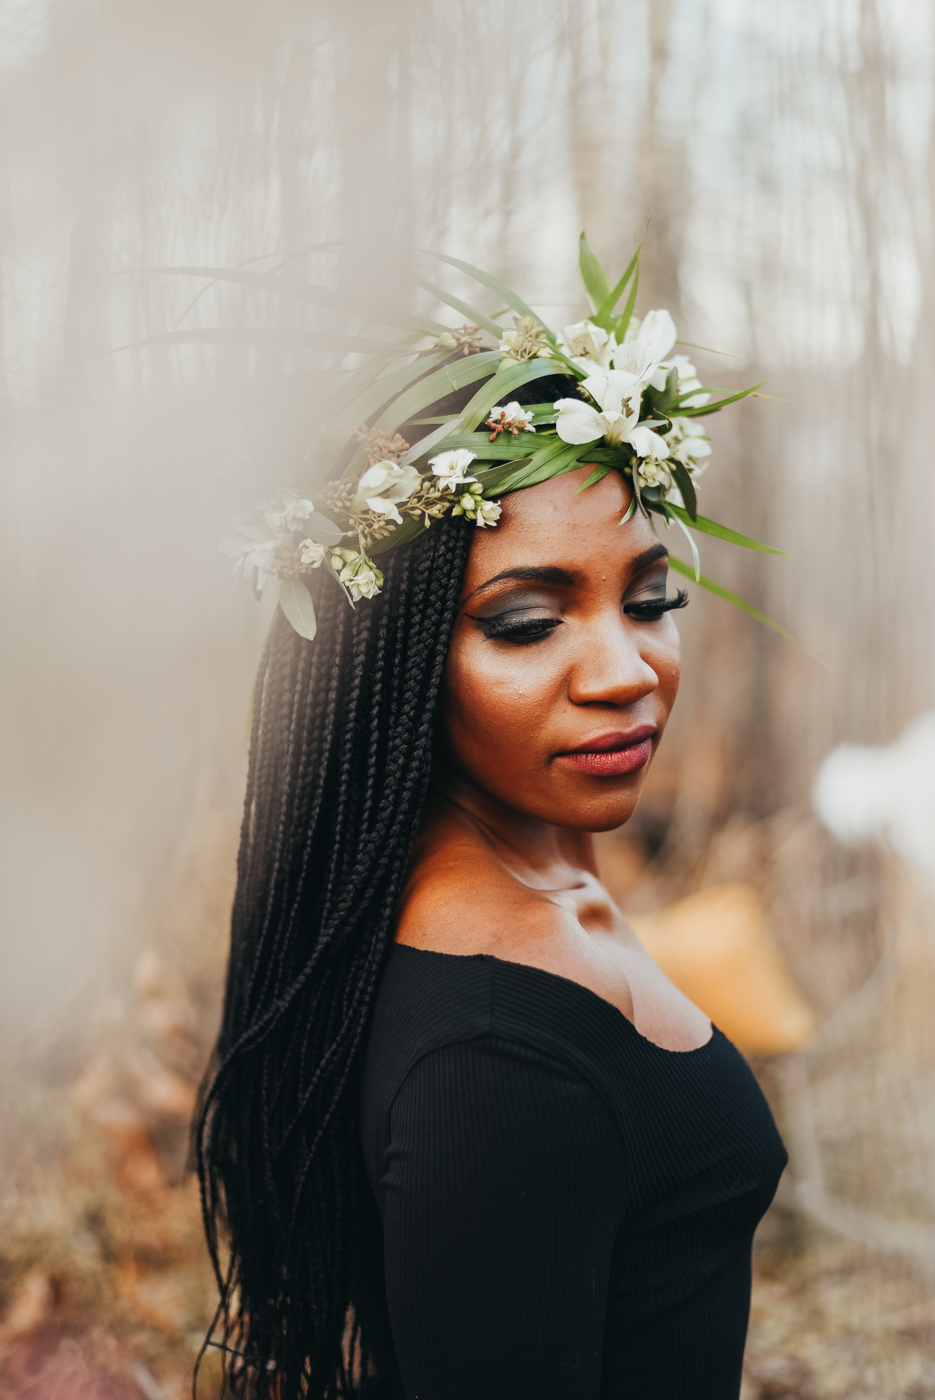 FortSt.John_photographer_TyraEPhotography_Wedding_Couple_Family_Photograhy_DawsonCreek_Elopement_Bride_Boduoir_Portraits-22.jpg